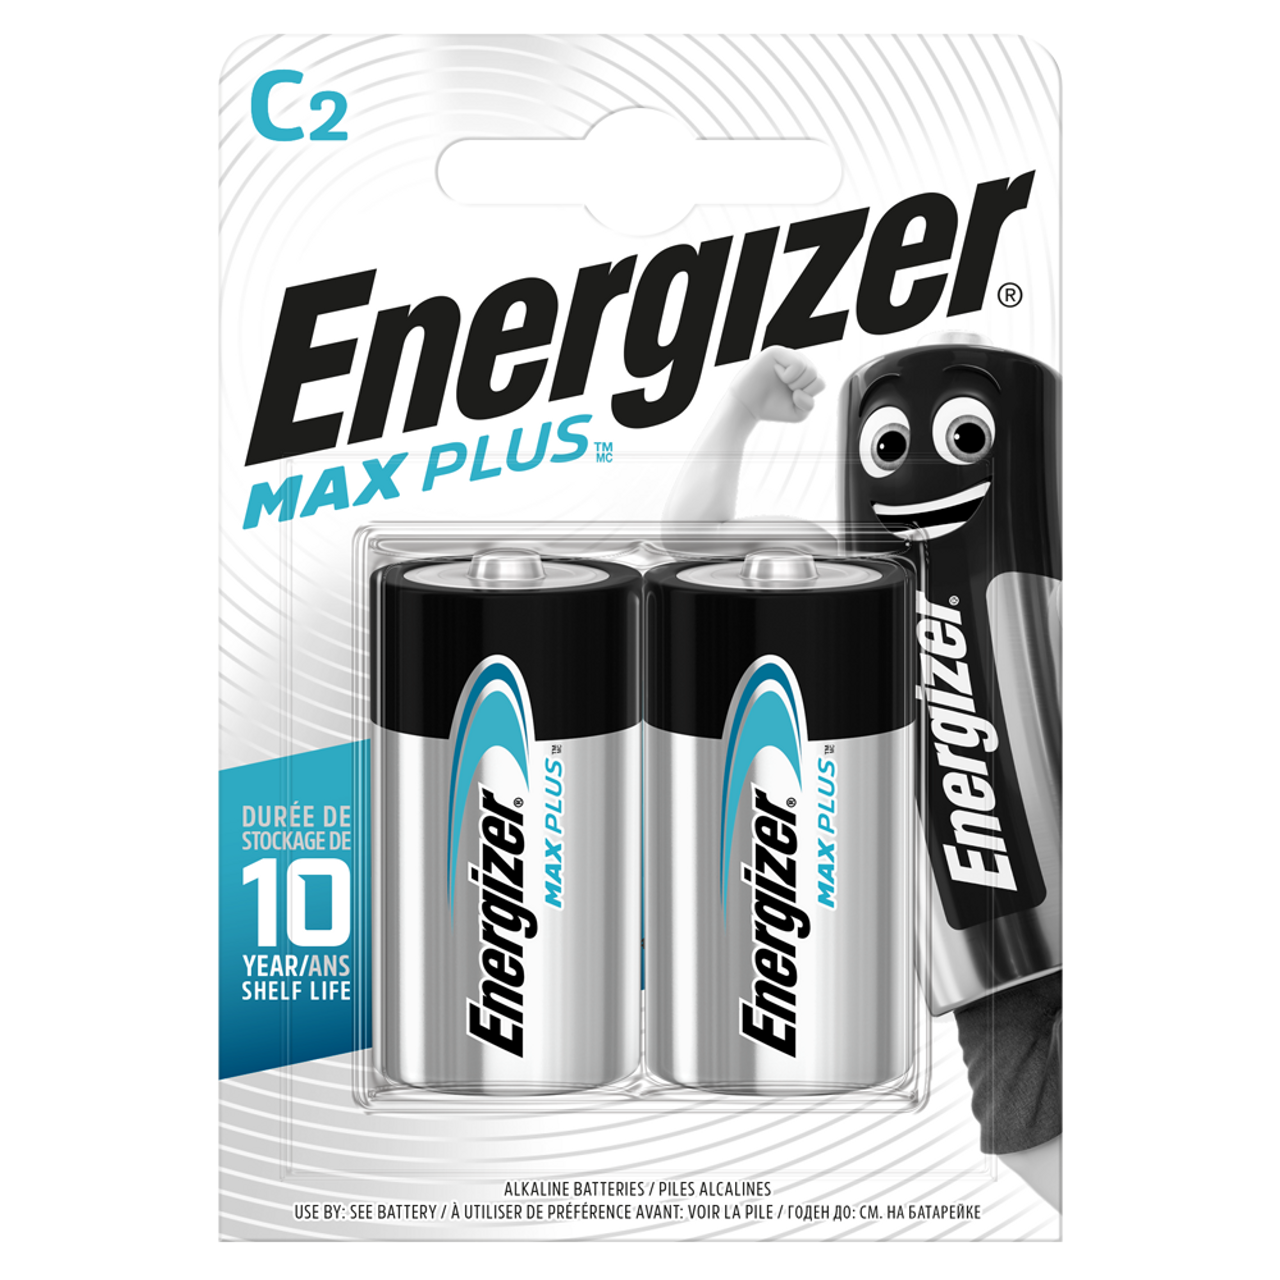 Energizer Maxplus C Lr14 Batteries 2 Pack Batterystation Co Uk